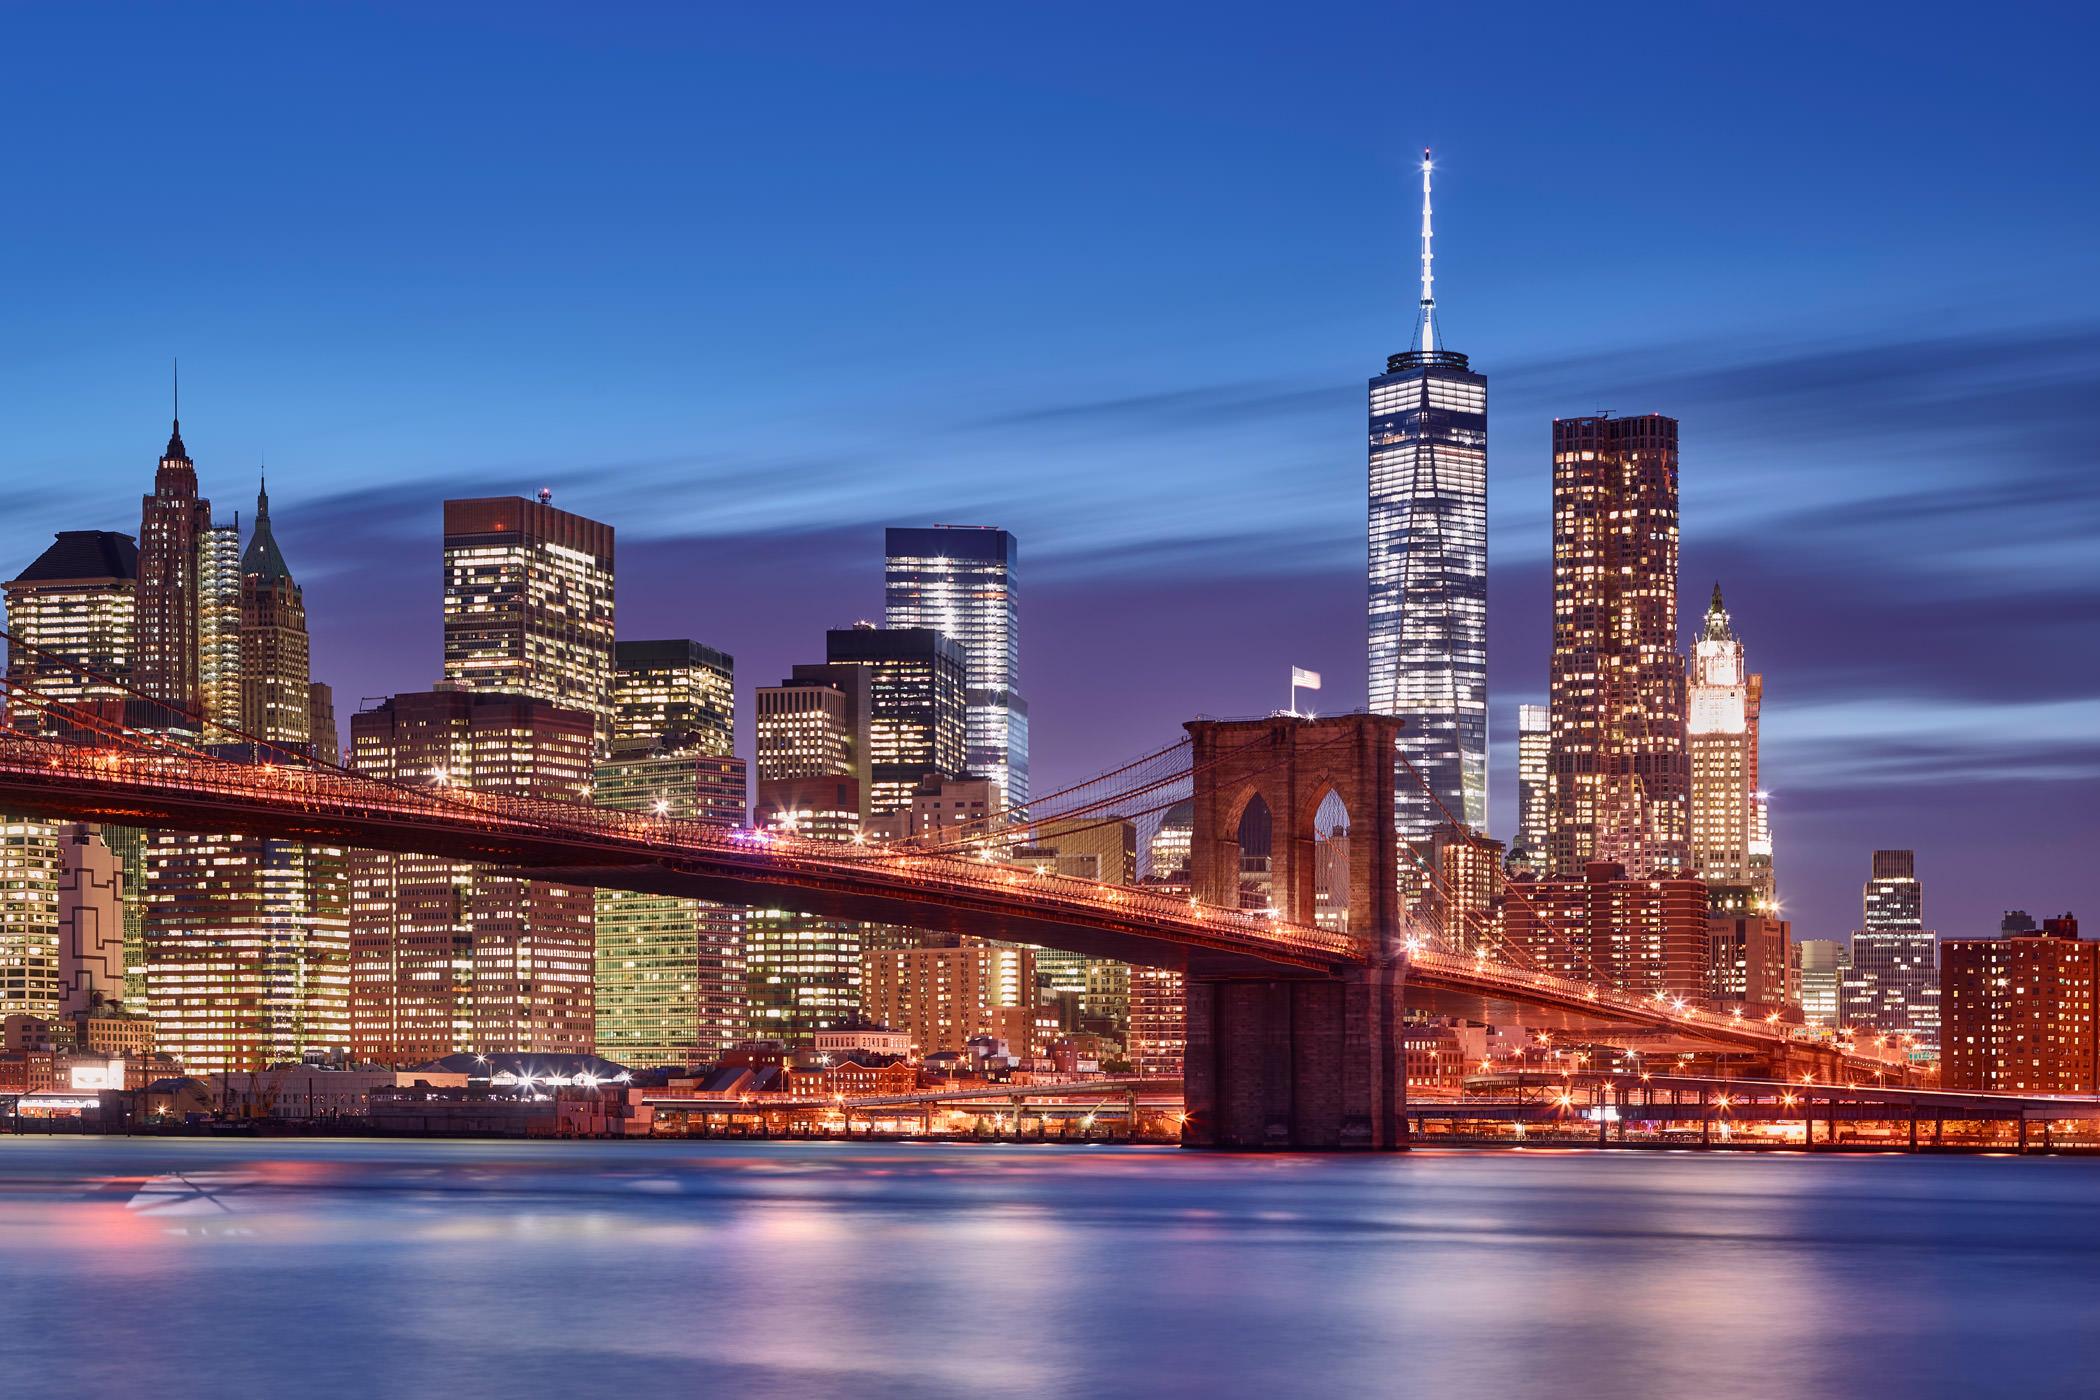 Late Fall Desktop Wallpaper New York City The 2014 Manhattan Cityscapes